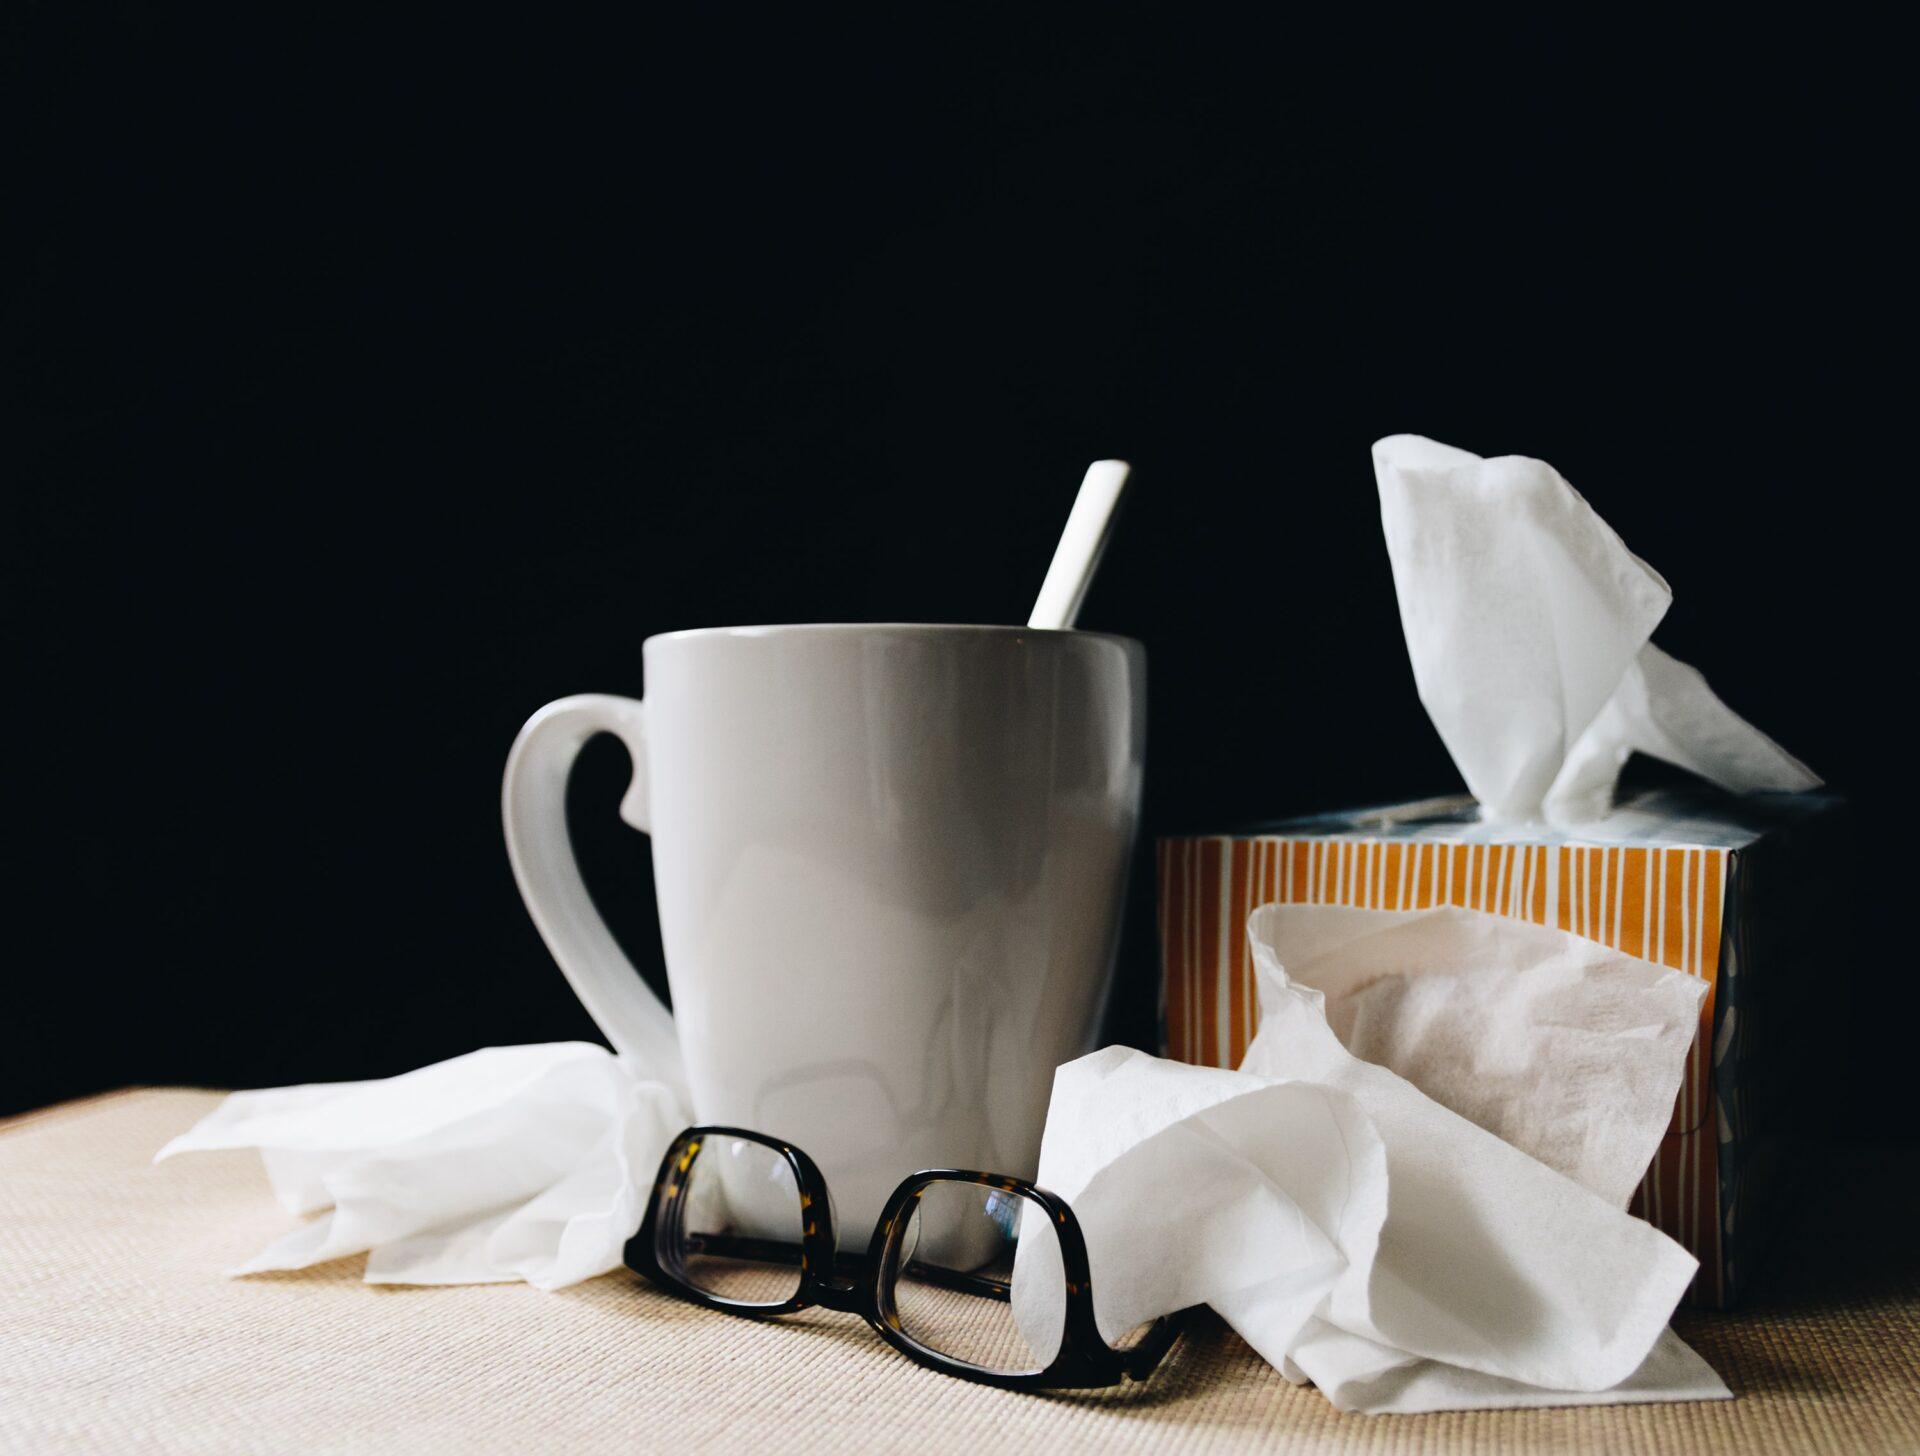 Grippe_Coronavirus_Veranstaltungen